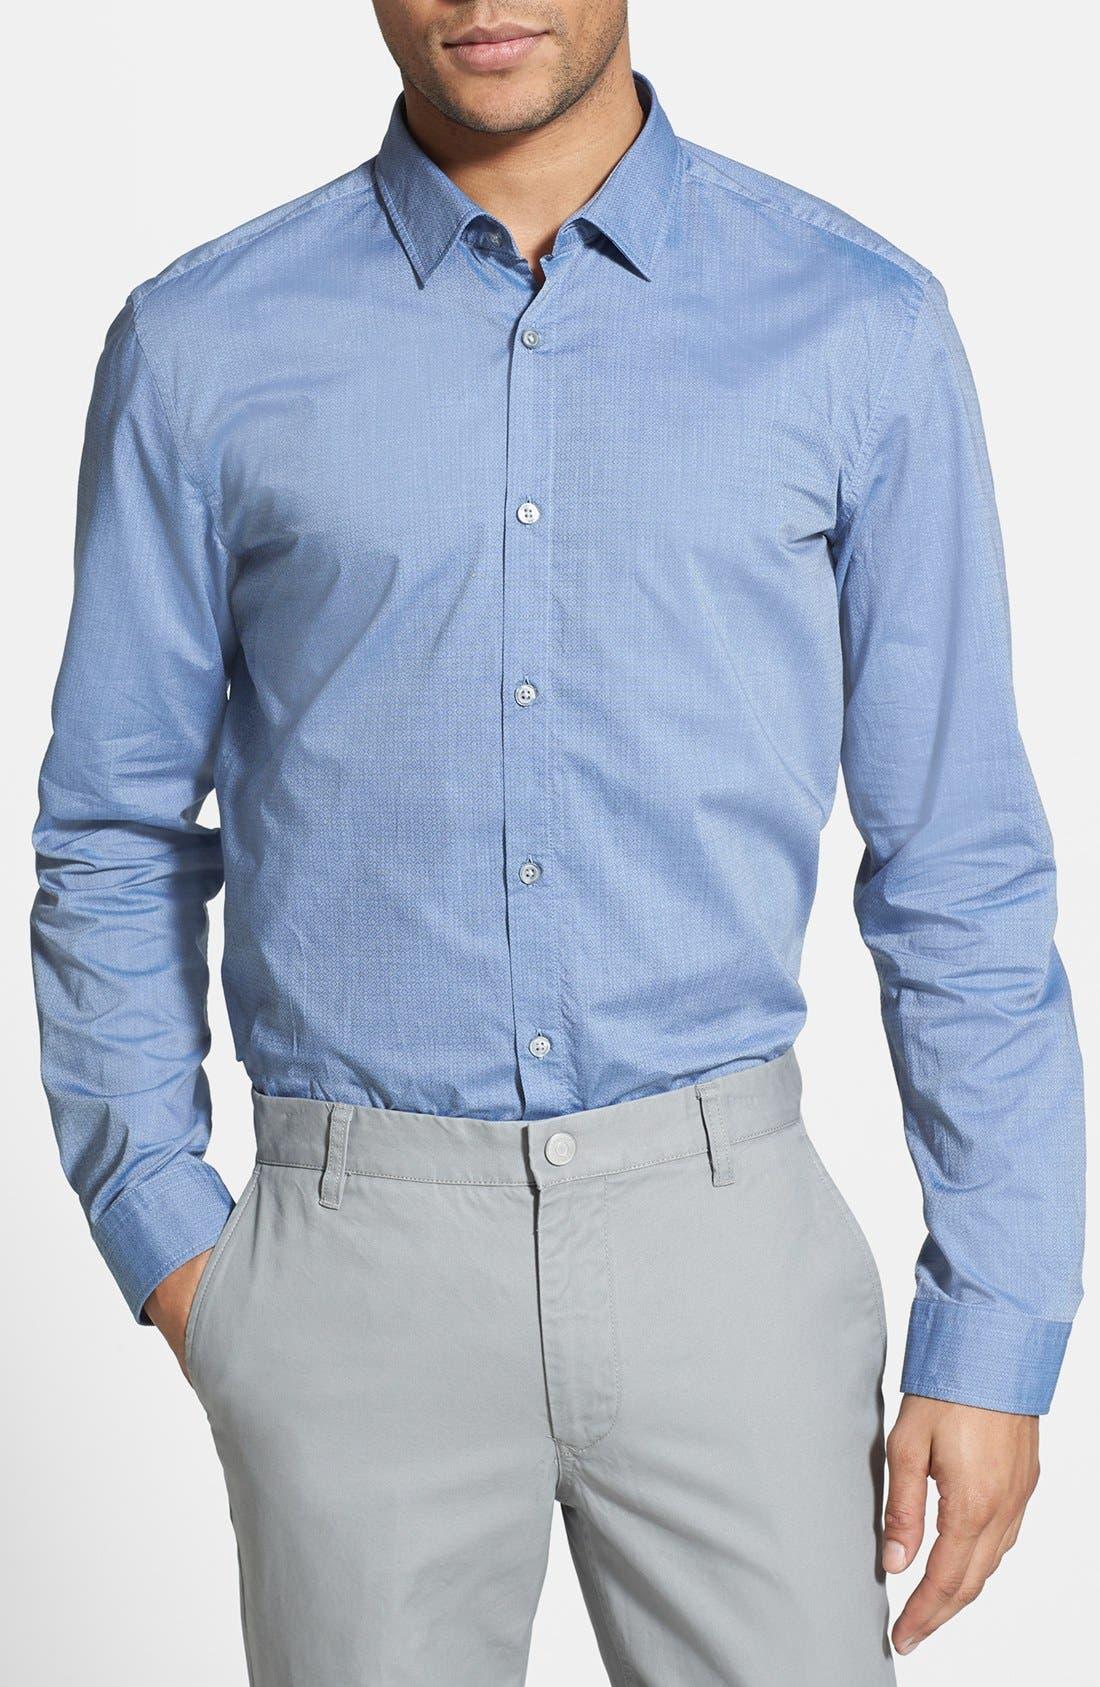 Alternate Image 1 Selected - BOSS HUGO BOSS 'Nemos' Slim Fit Sport Shirt